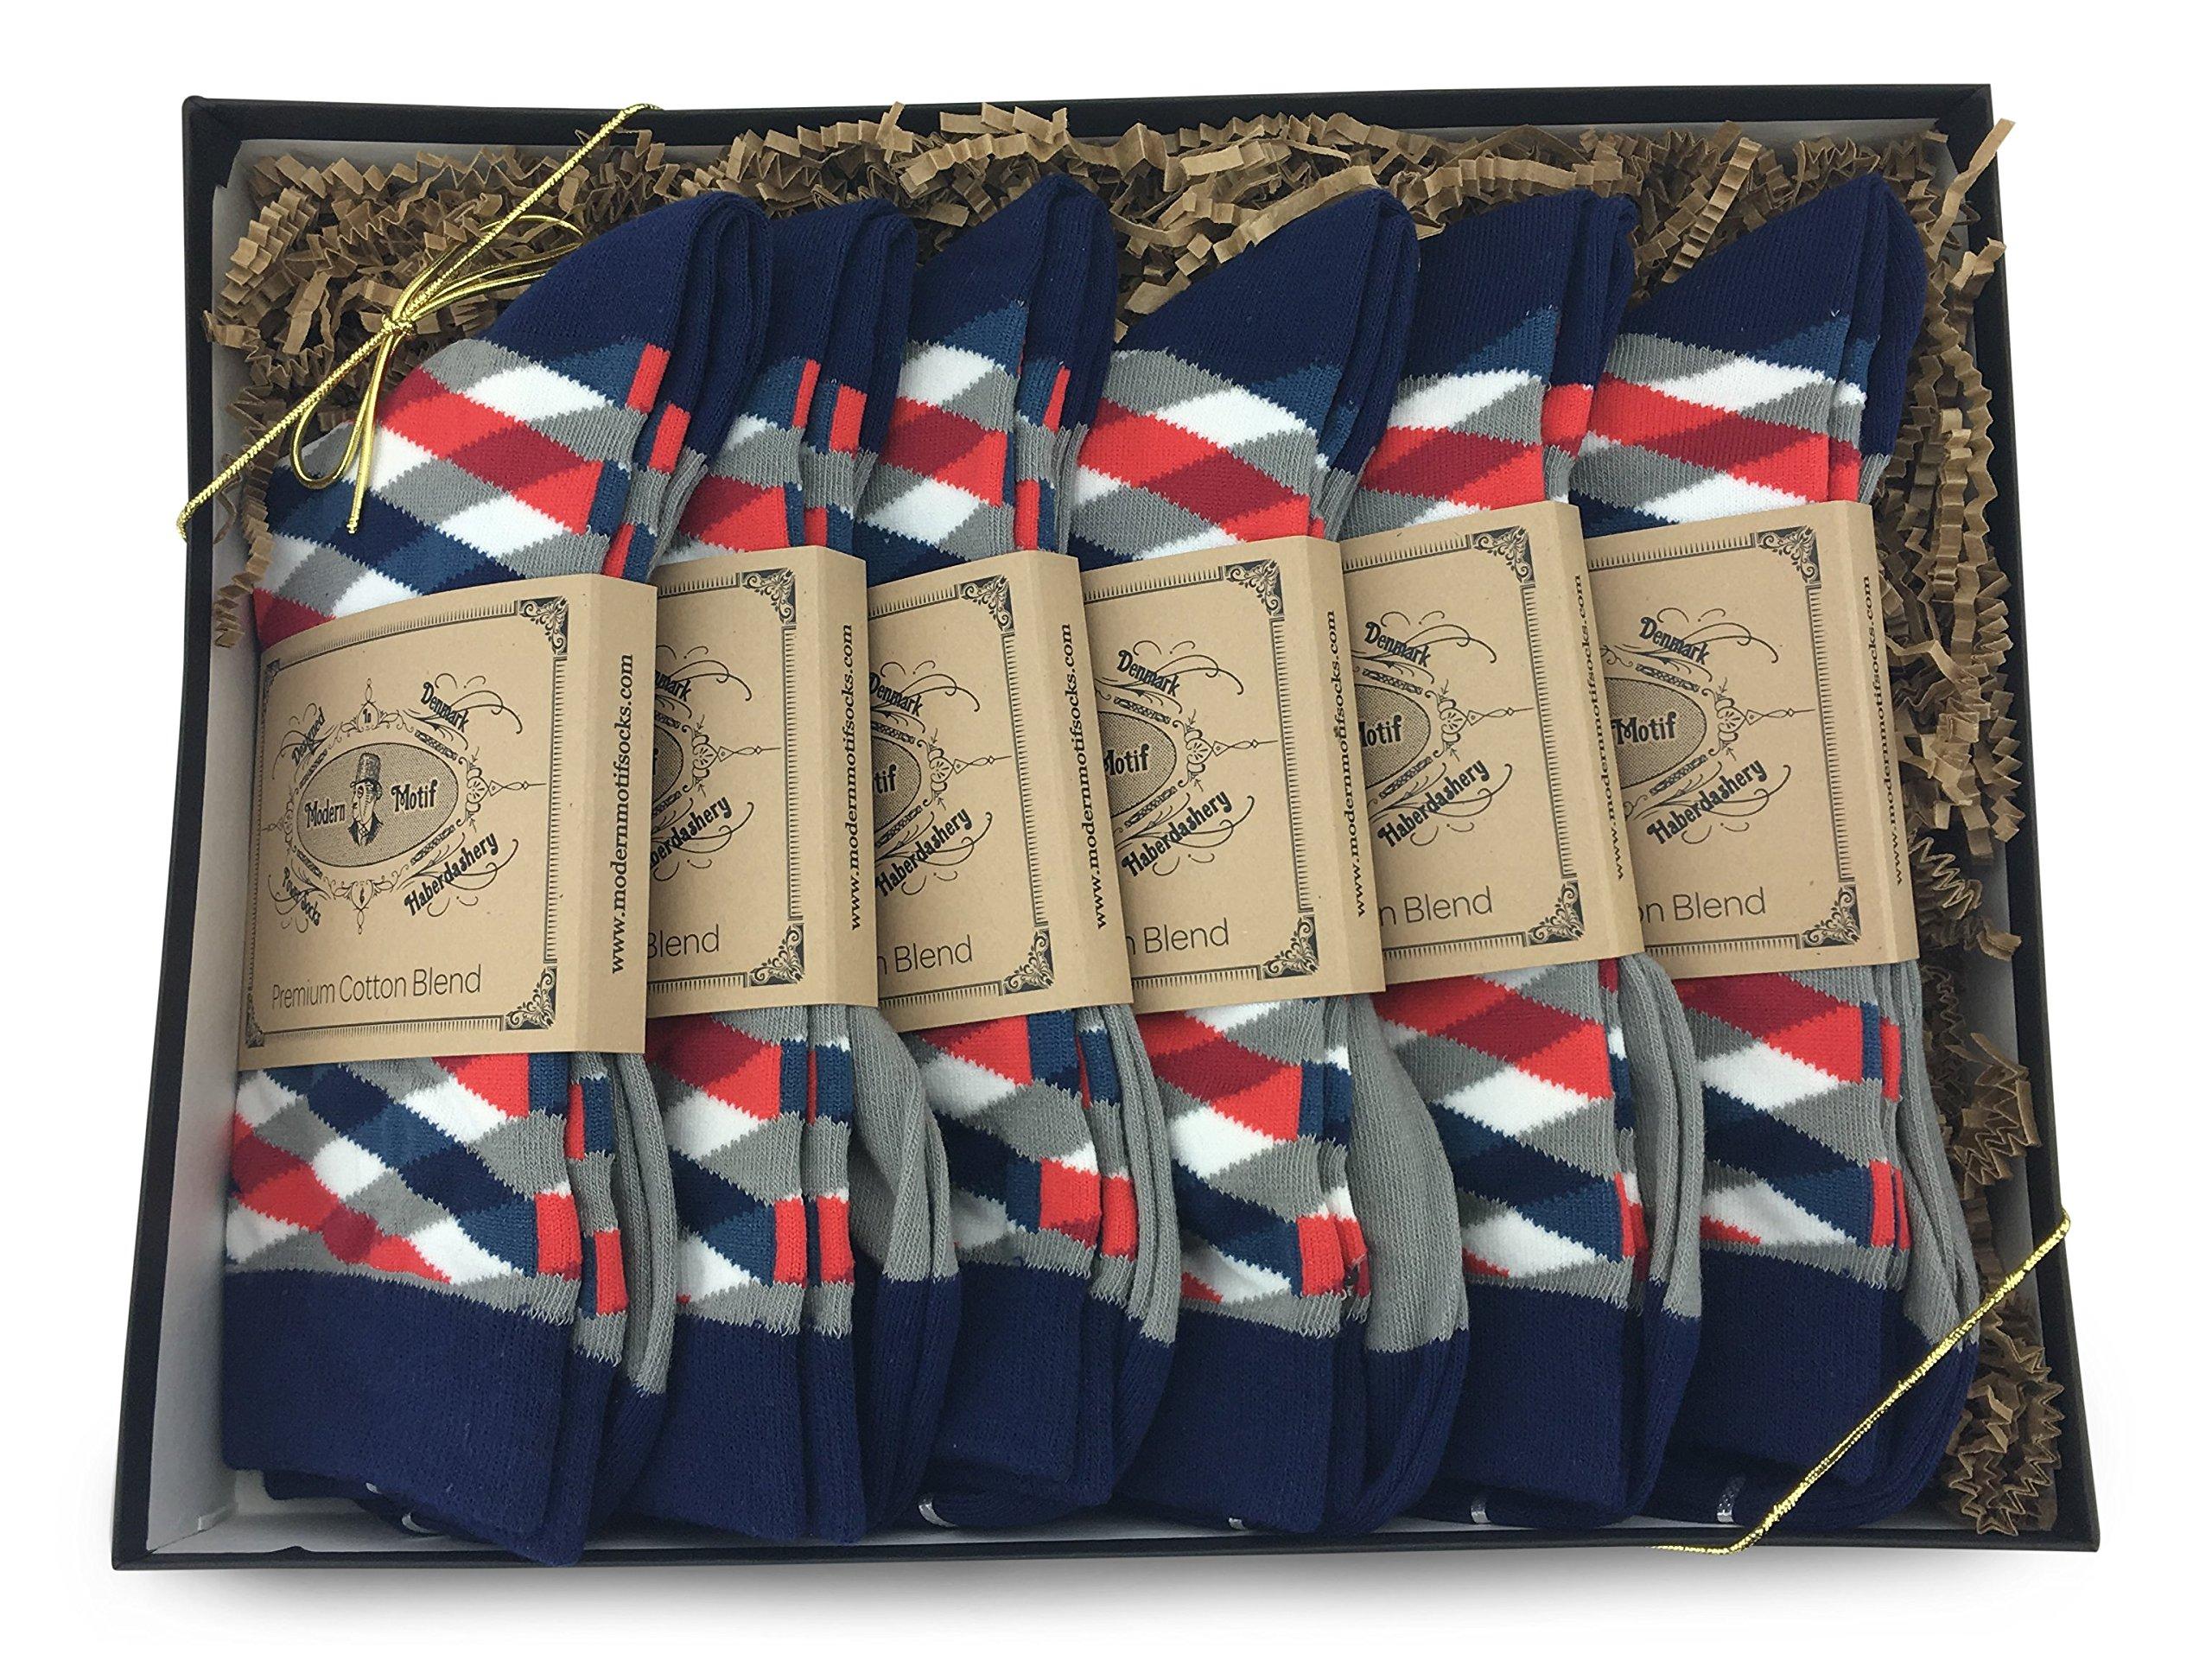 Modern Motif - 6 Pair Men's Matching Dress Socks Gift Box | Groomsmen Weddings Party Events